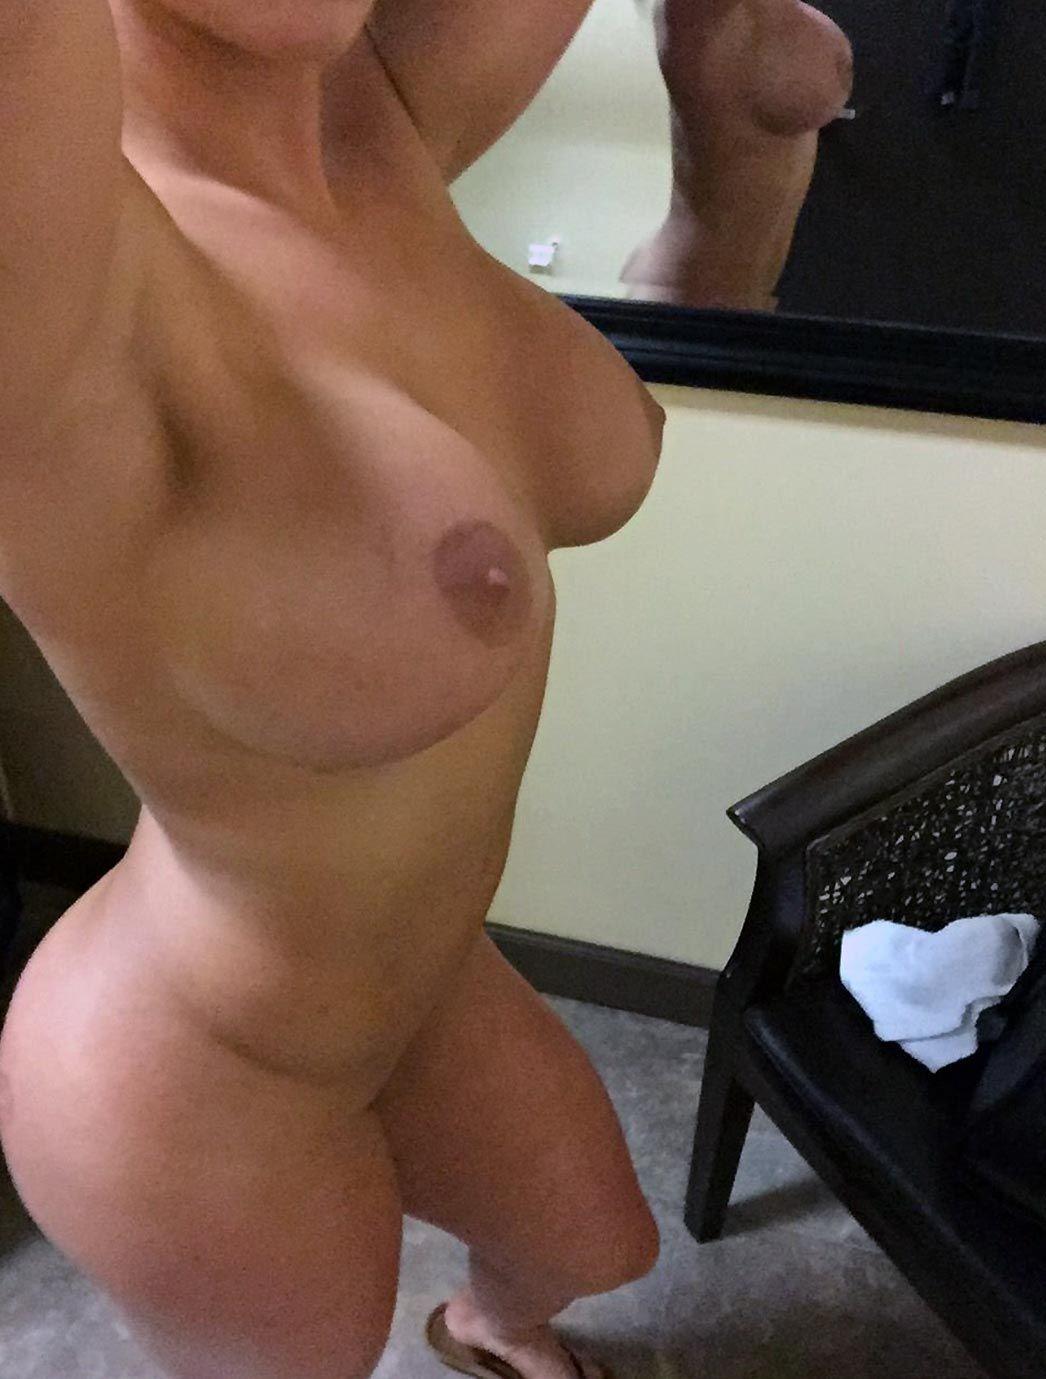 Celeste Bonin Nude Leaked The Fappening & Sexy 0325